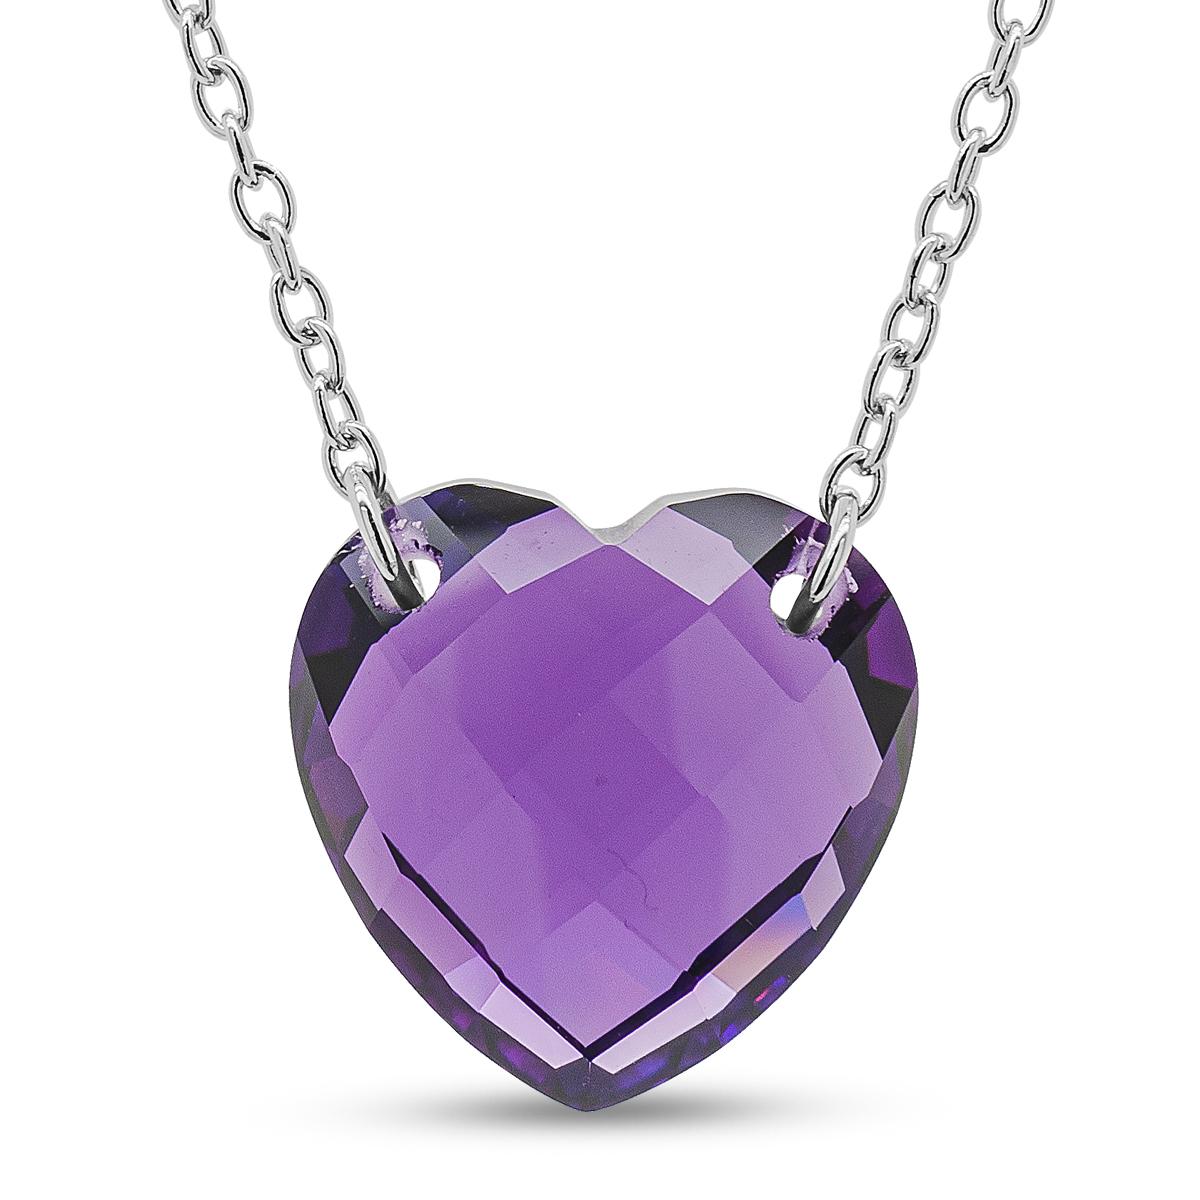 Amethyst Murano glass star 3 charm pendant necklace